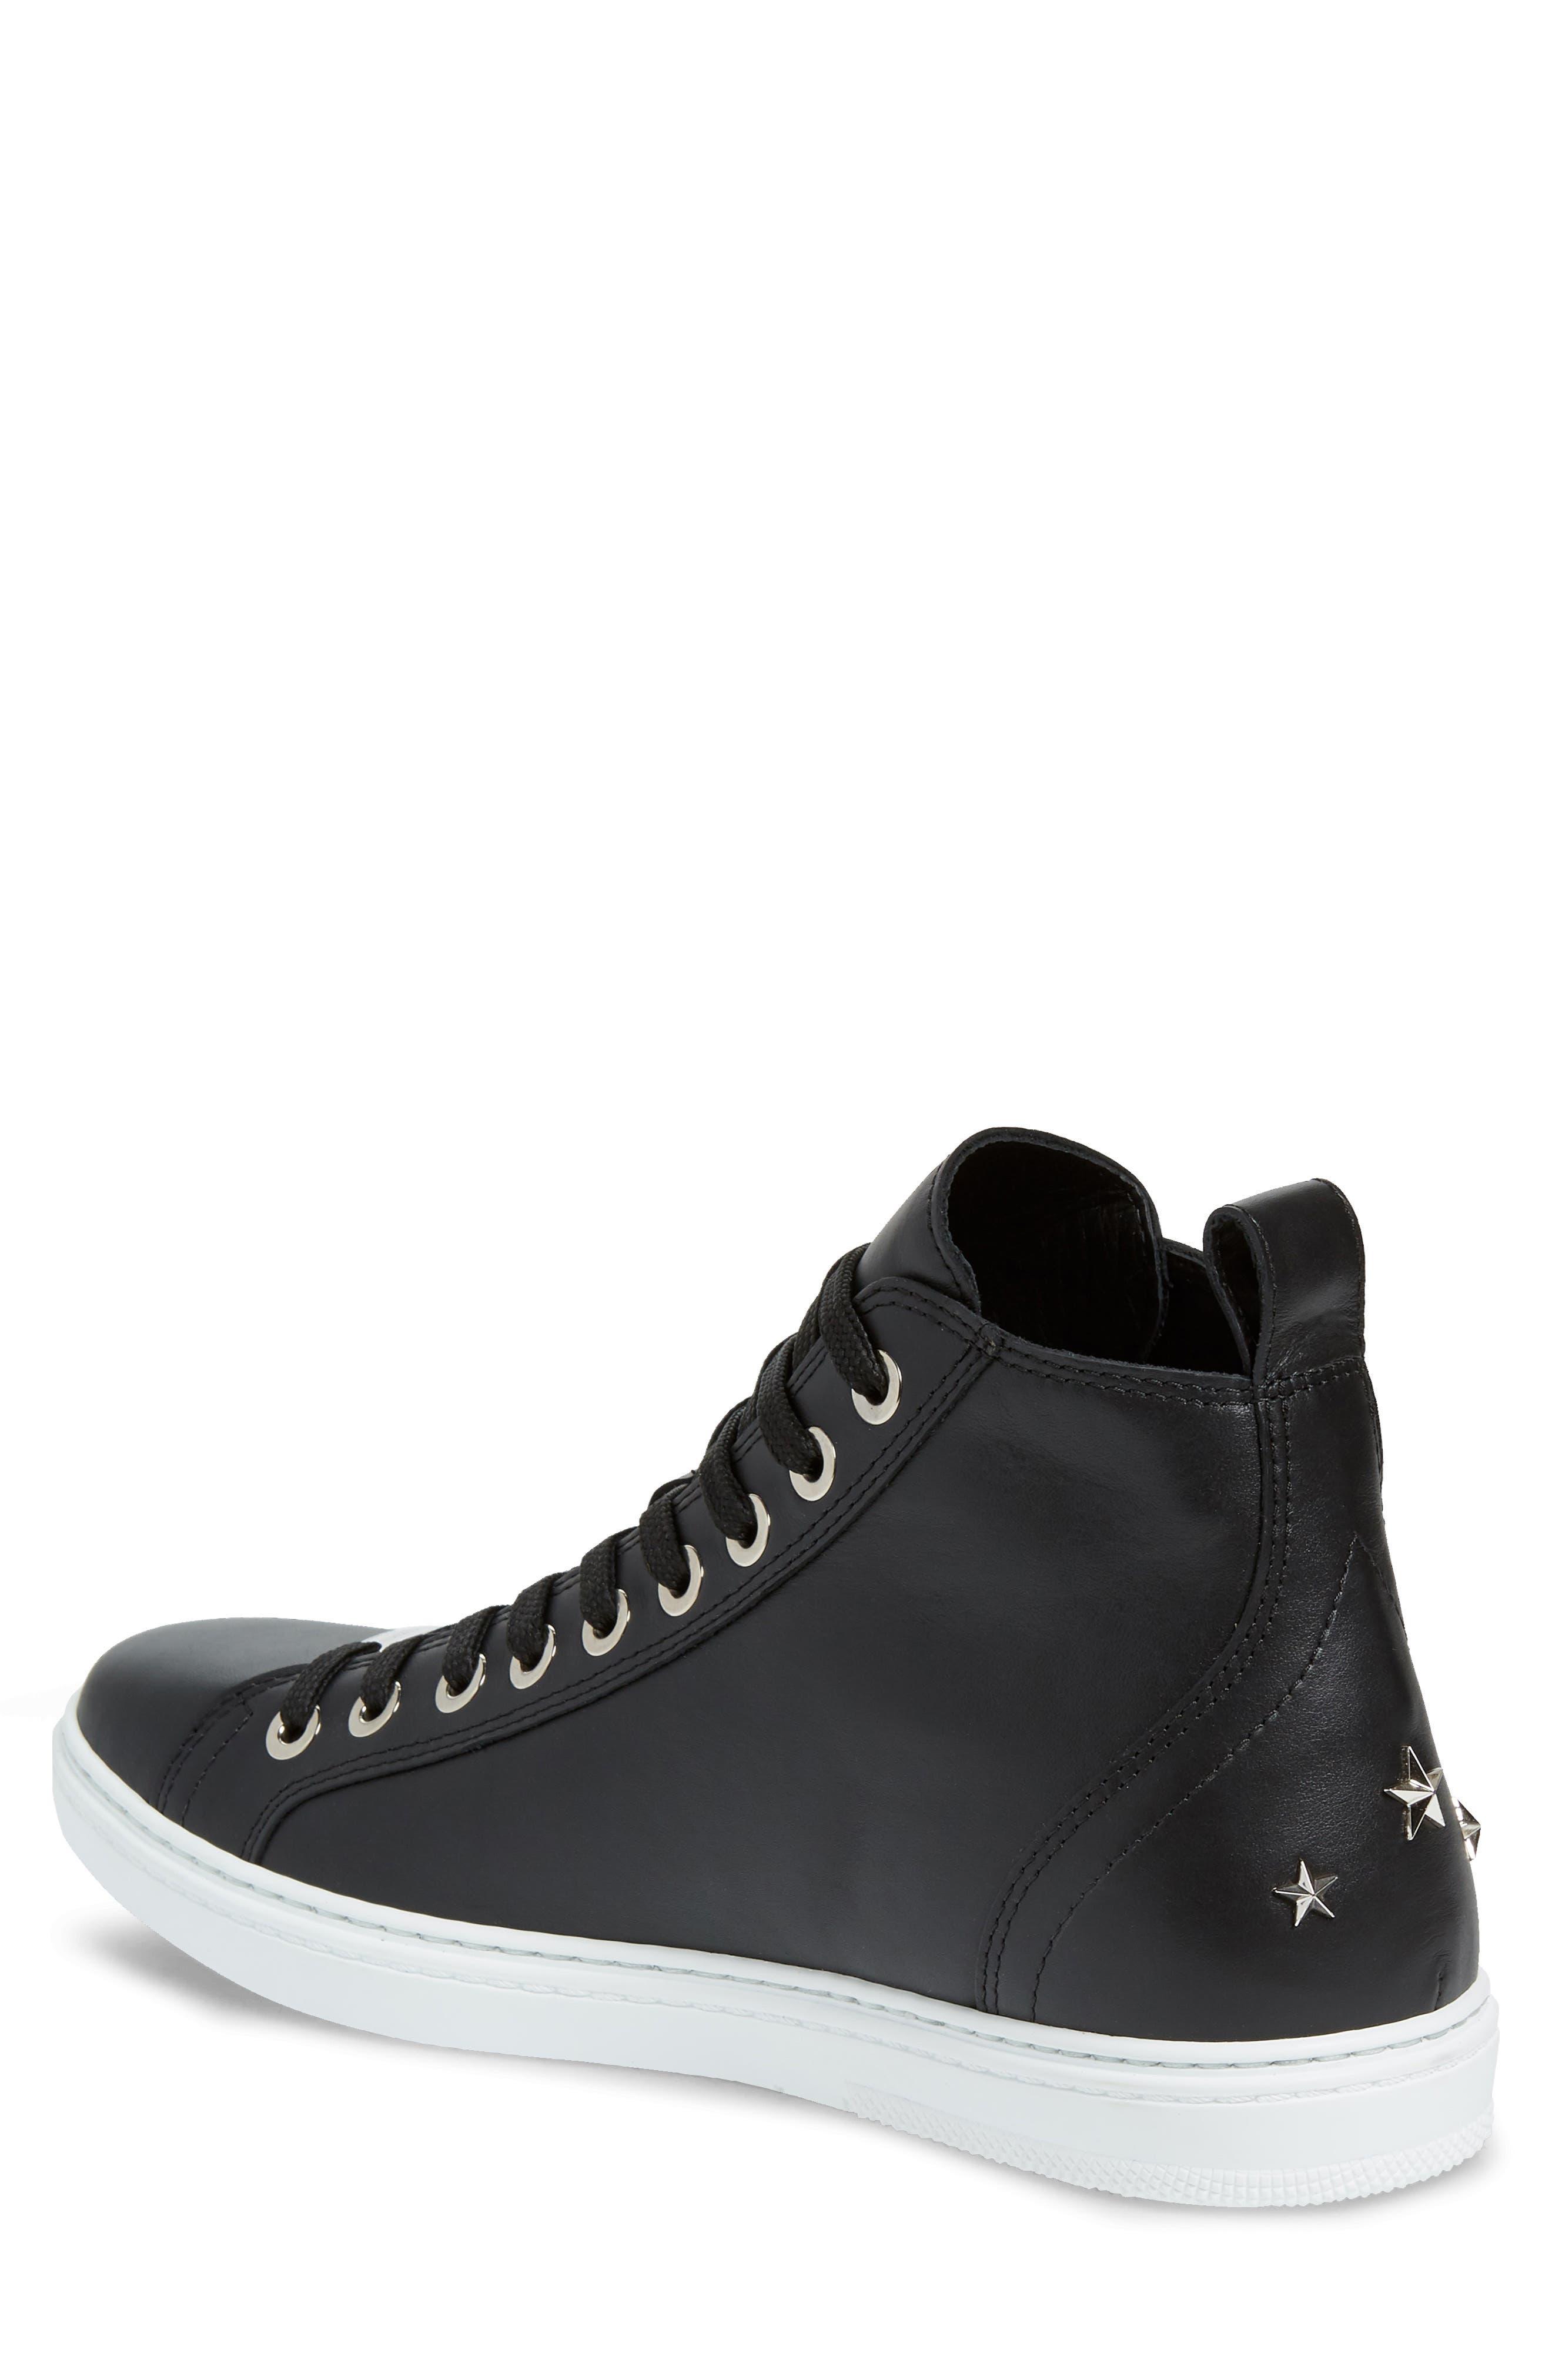 Colt High Top Sneaker,                             Alternate thumbnail 2, color,                             001